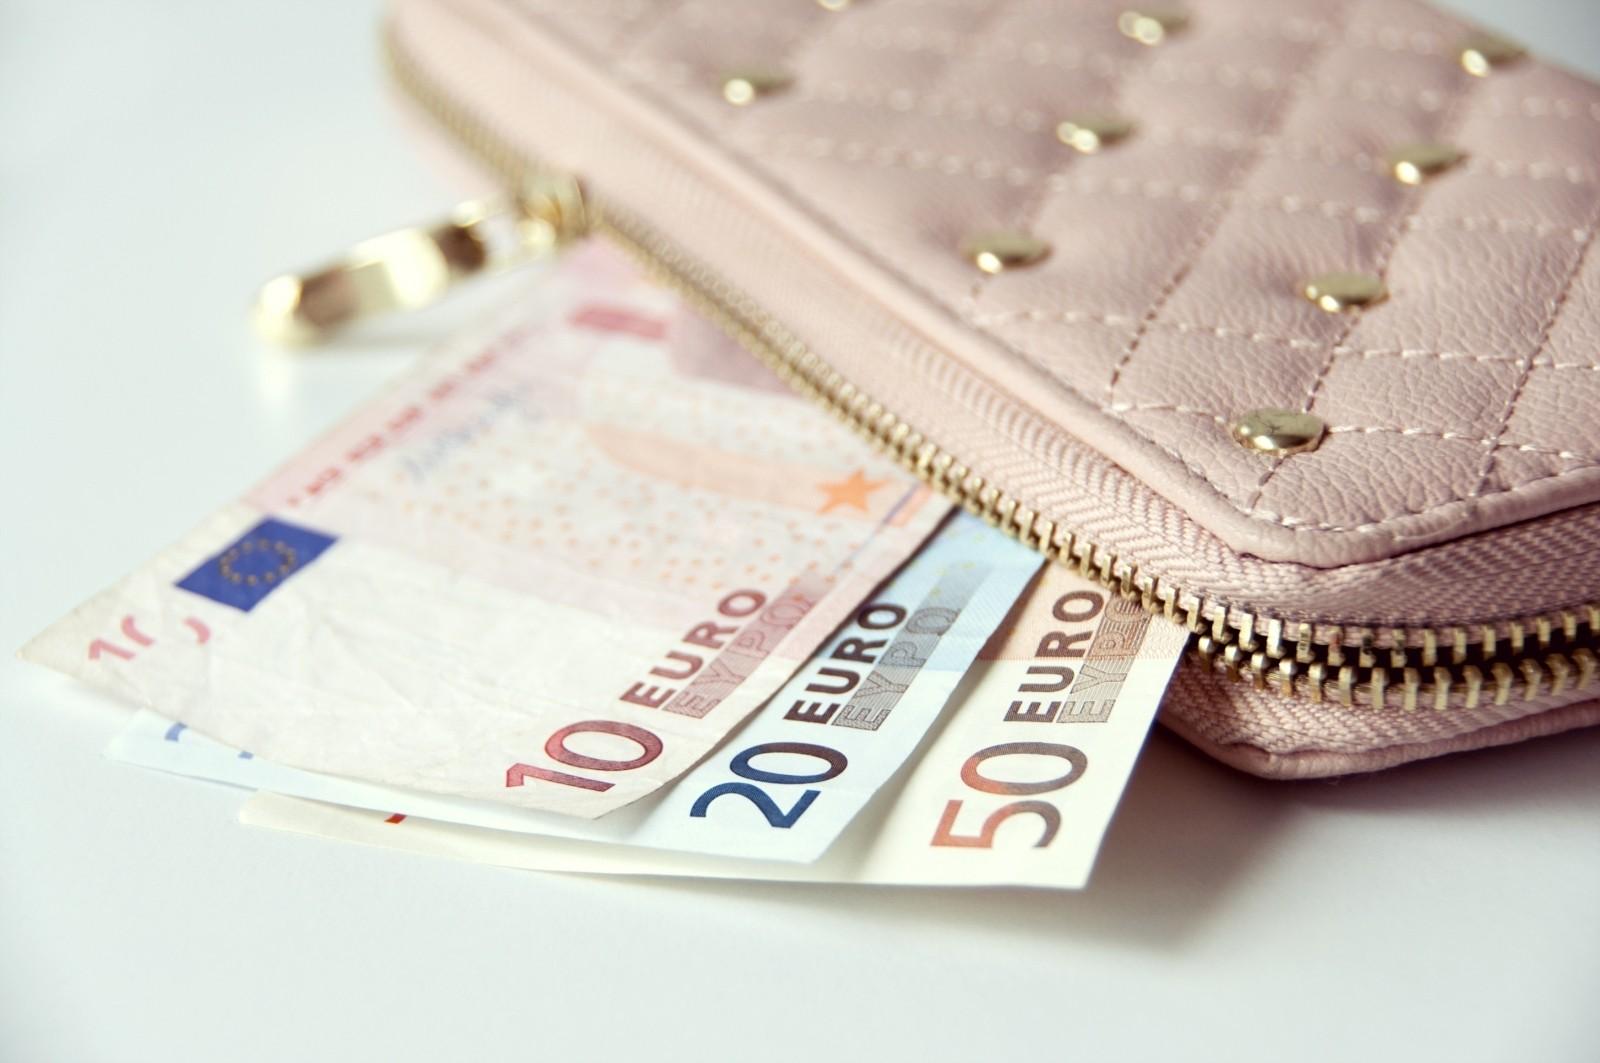 wallet-money-banknotes-euro-cash